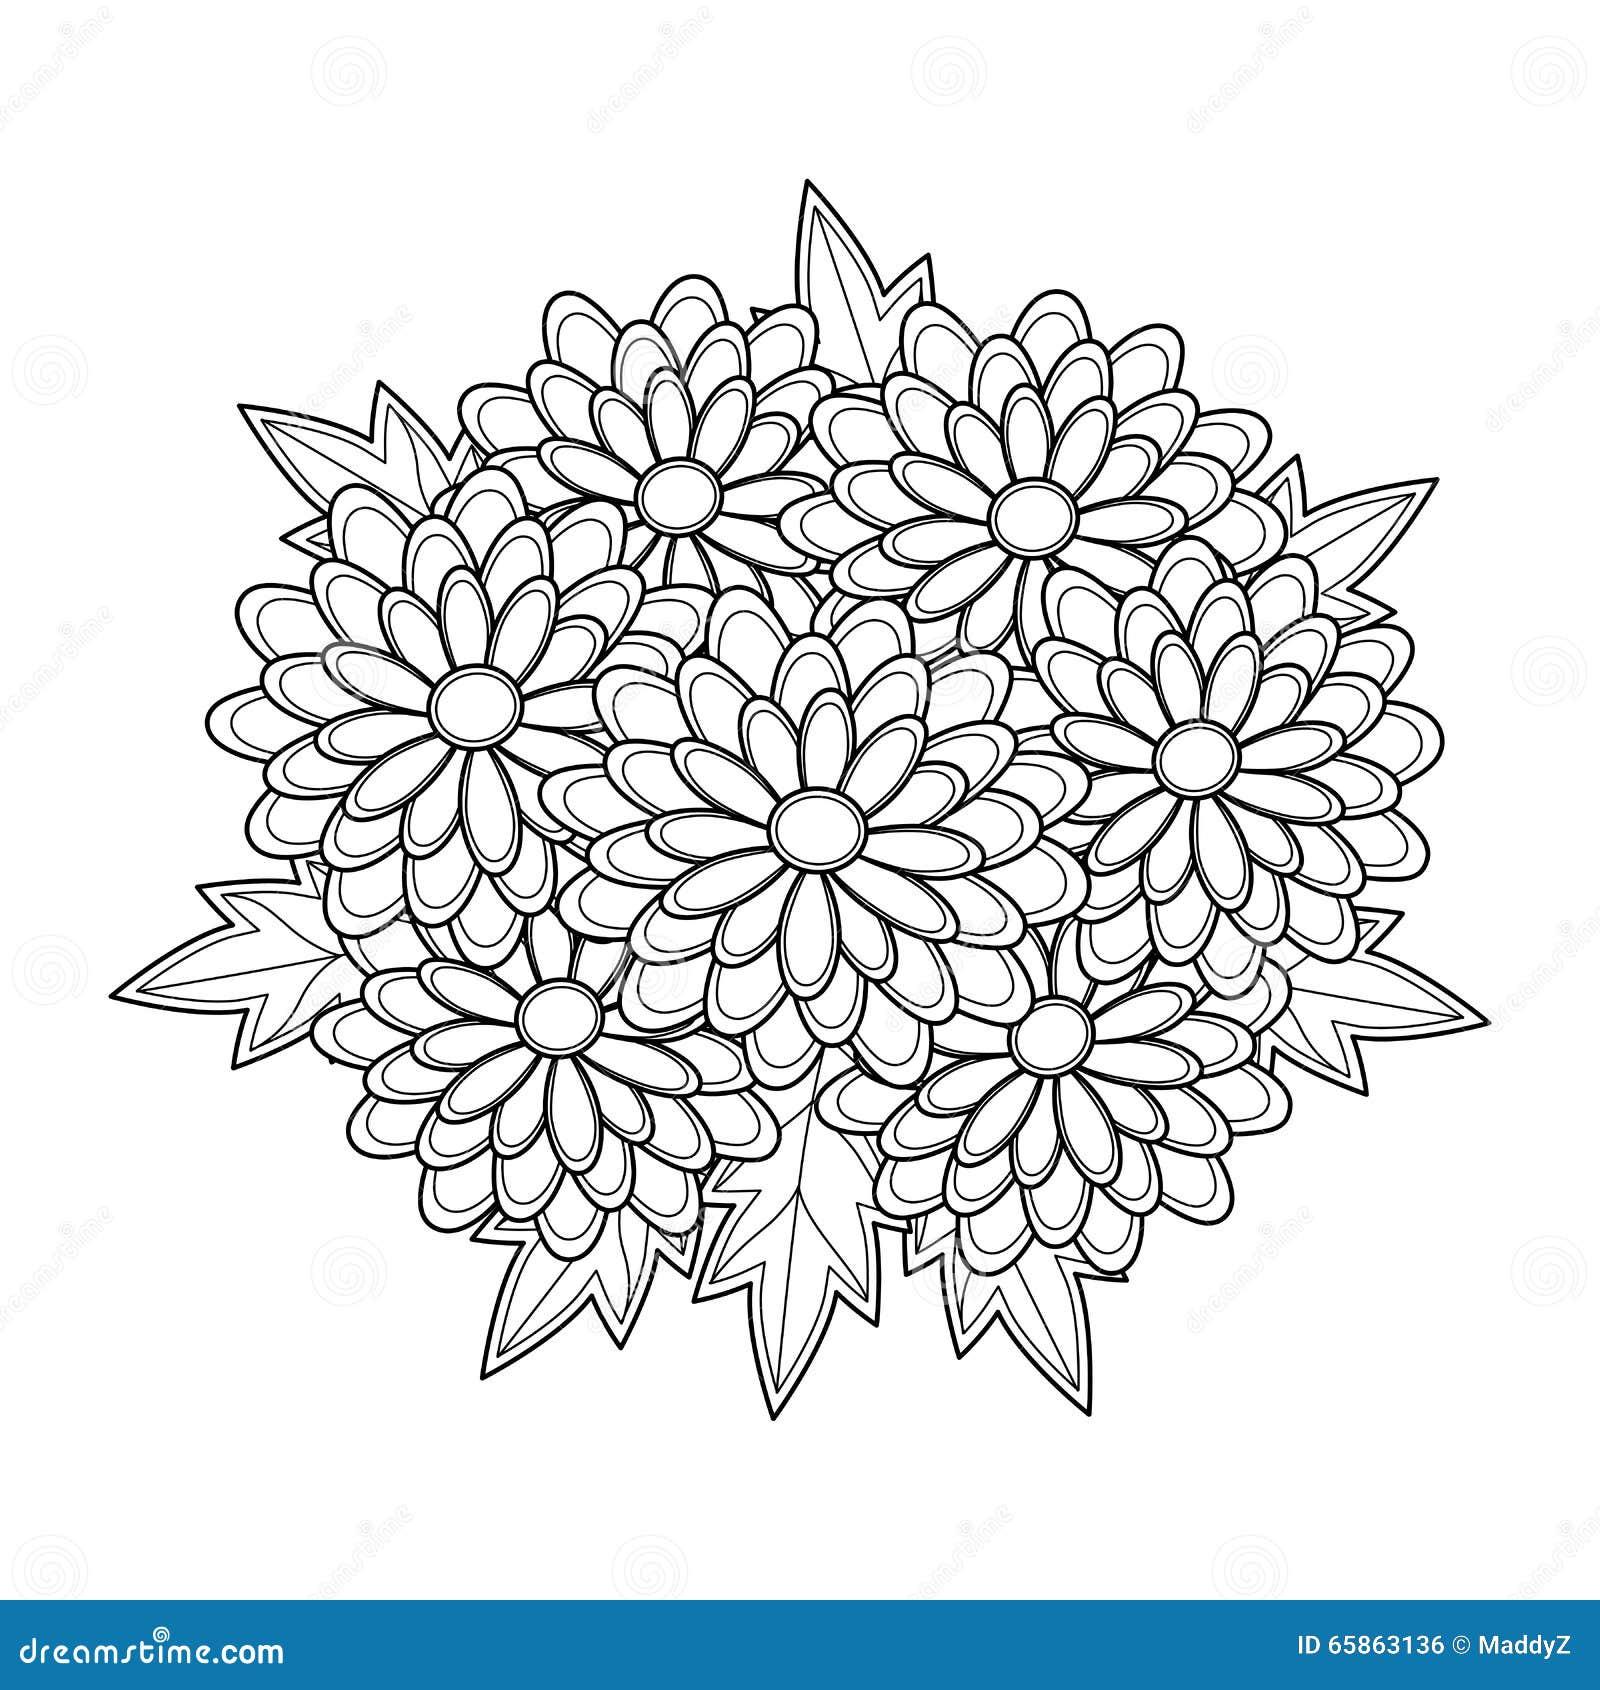 Doodle Art Flowers Chrysanthemum. Zentangle Floral Pattern. Stock ...